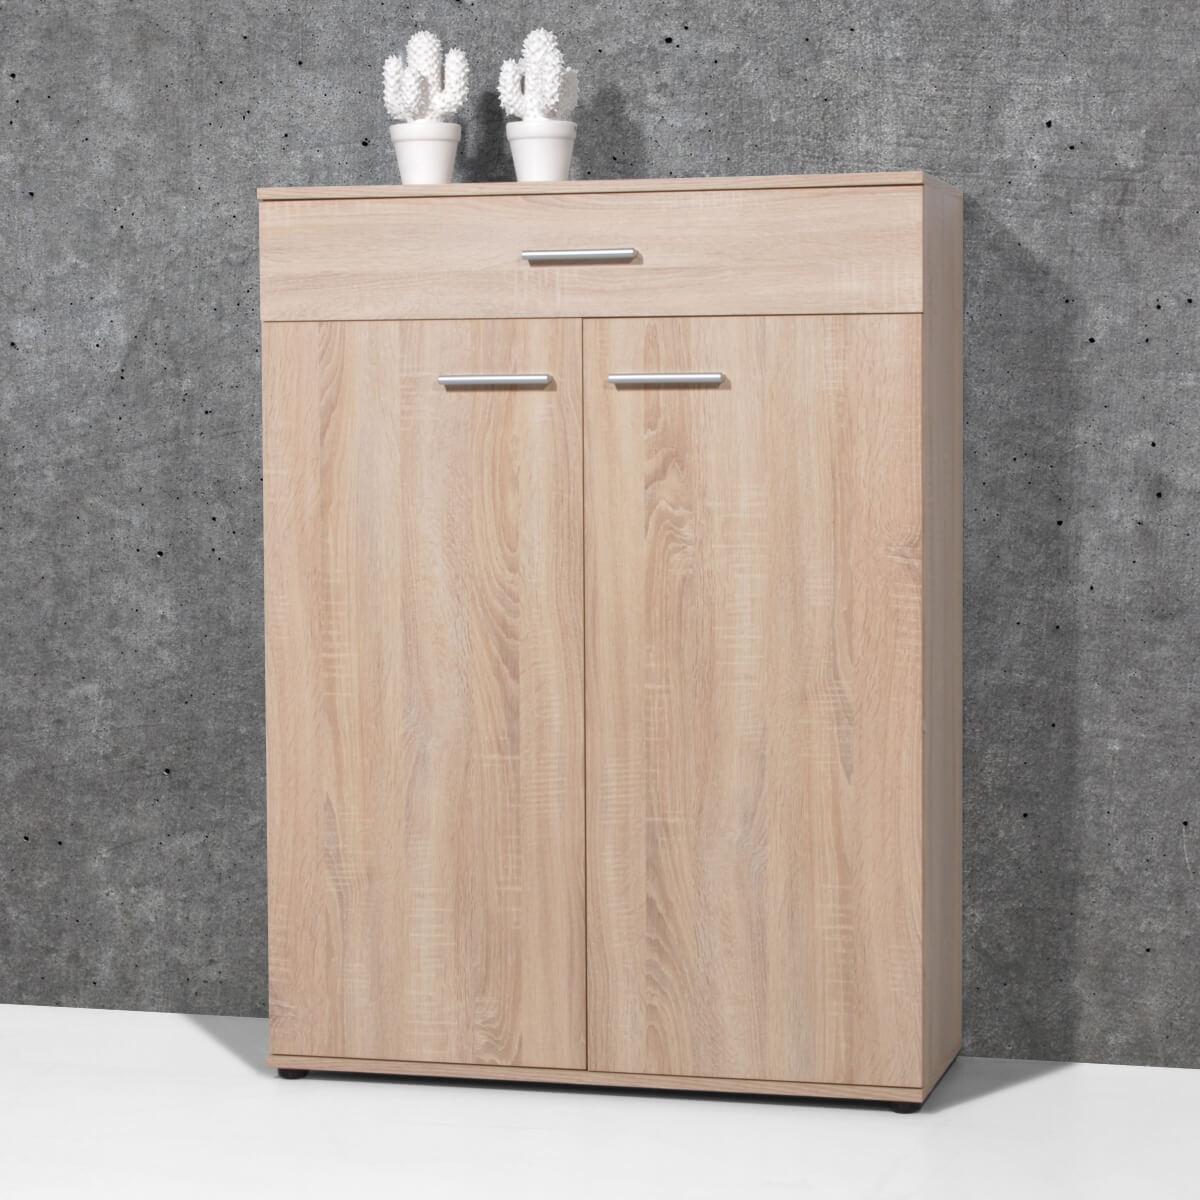 Modern shoe cupboard with a Sanremo oak finish